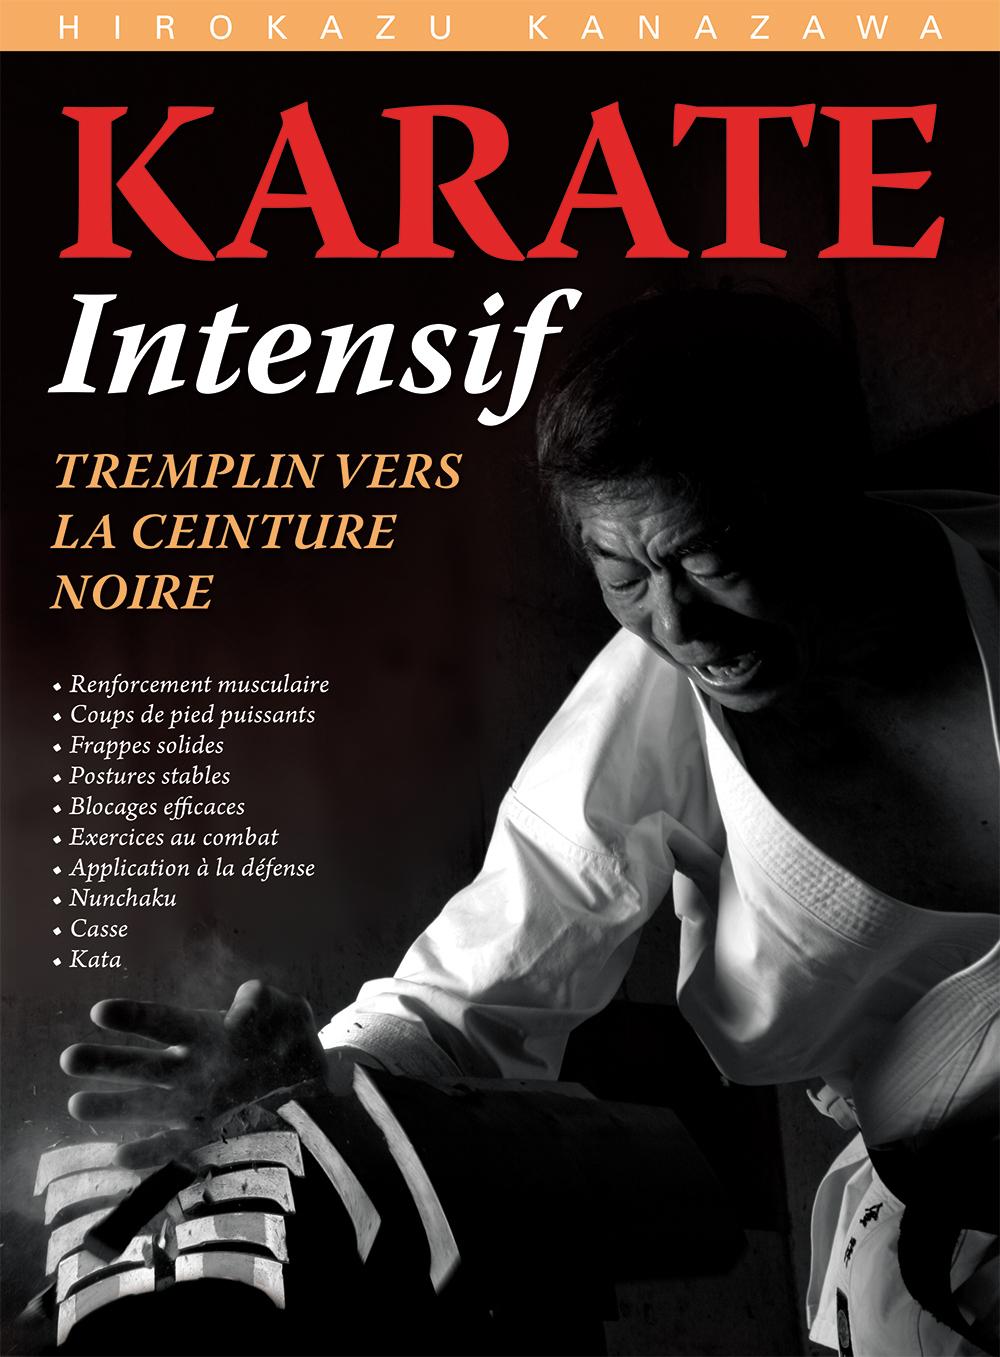 KARATE INTENSIF